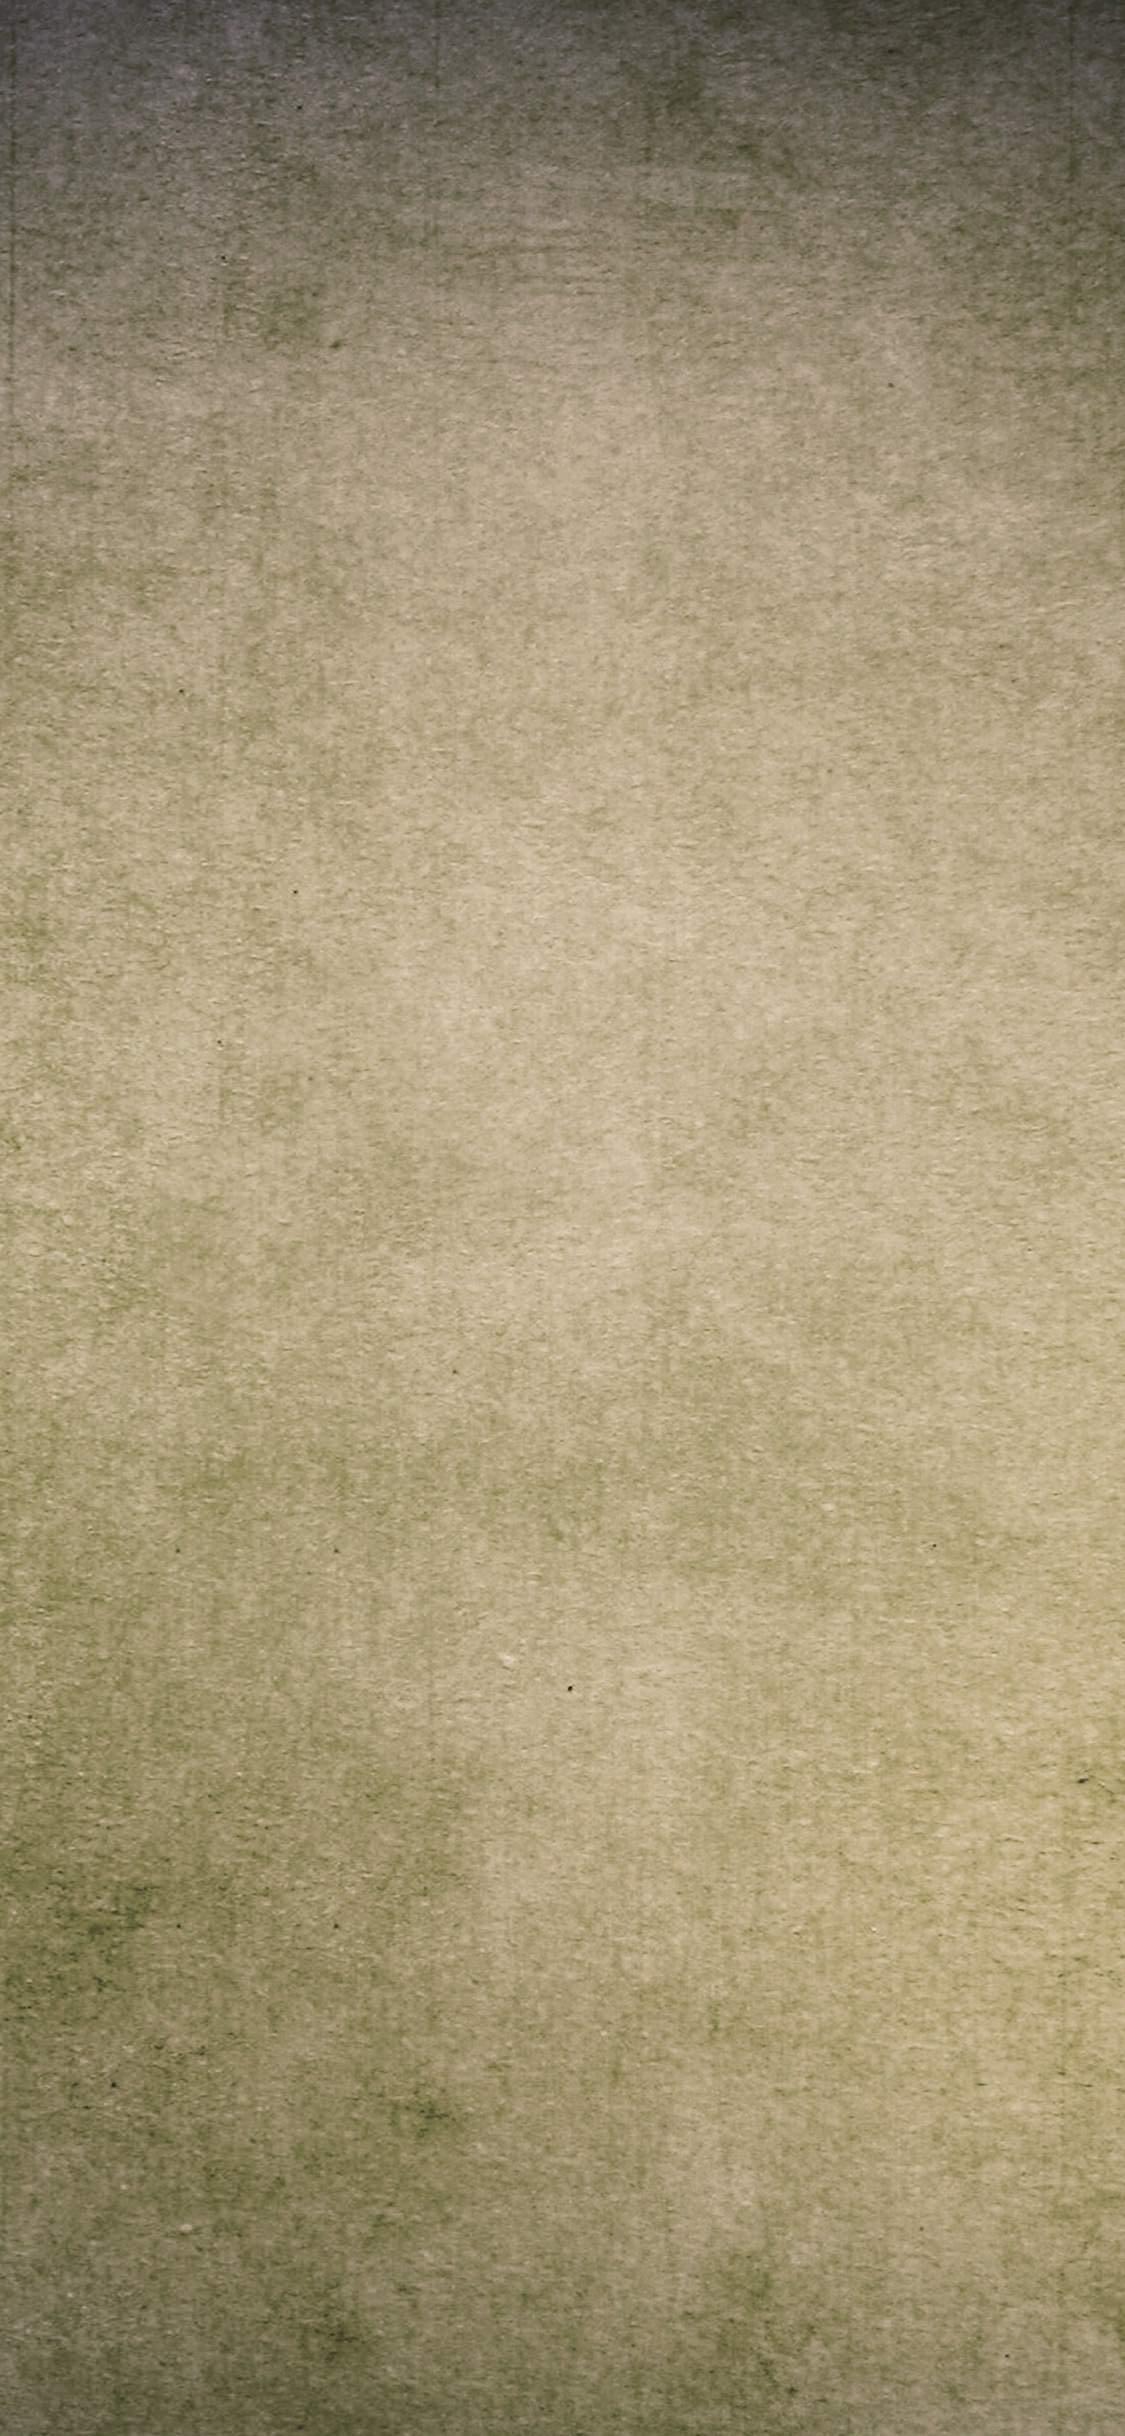 iPhone XS , iPhone X 壁紙 wallpaper 1050